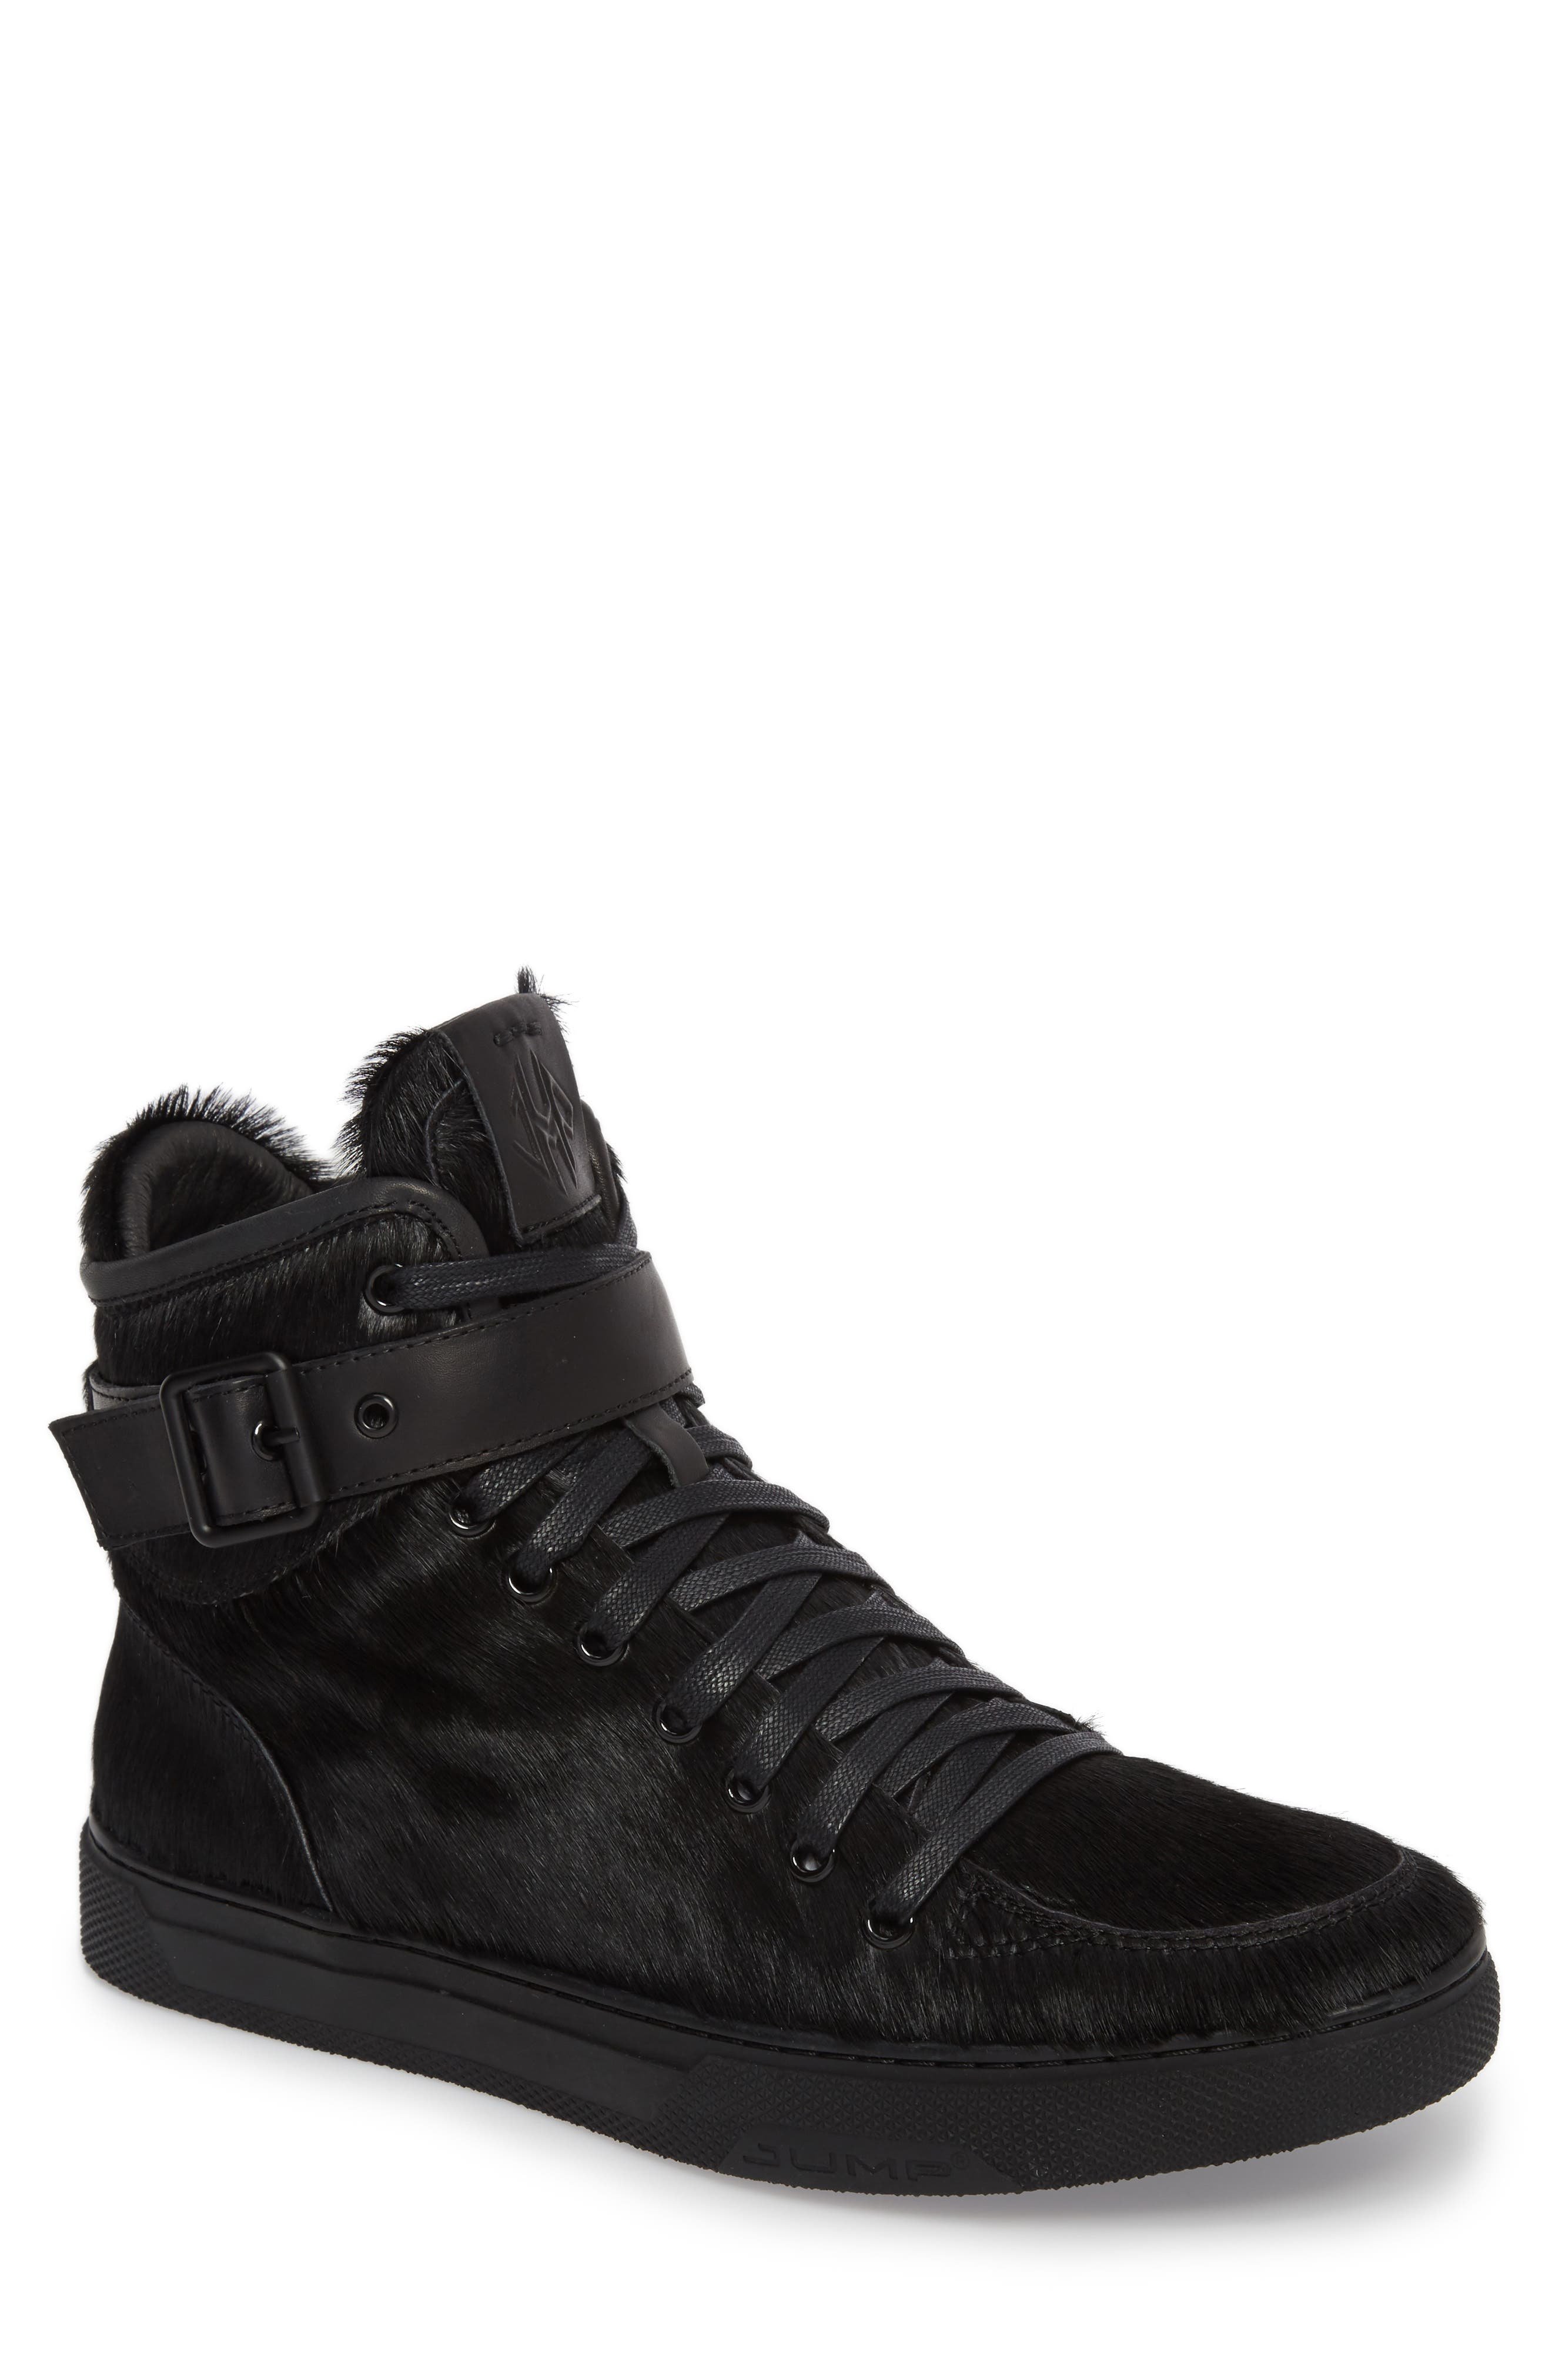 Sullivan Genuine Calf Hair High Top Sneaker,                         Main,                         color, Black Fur Leather